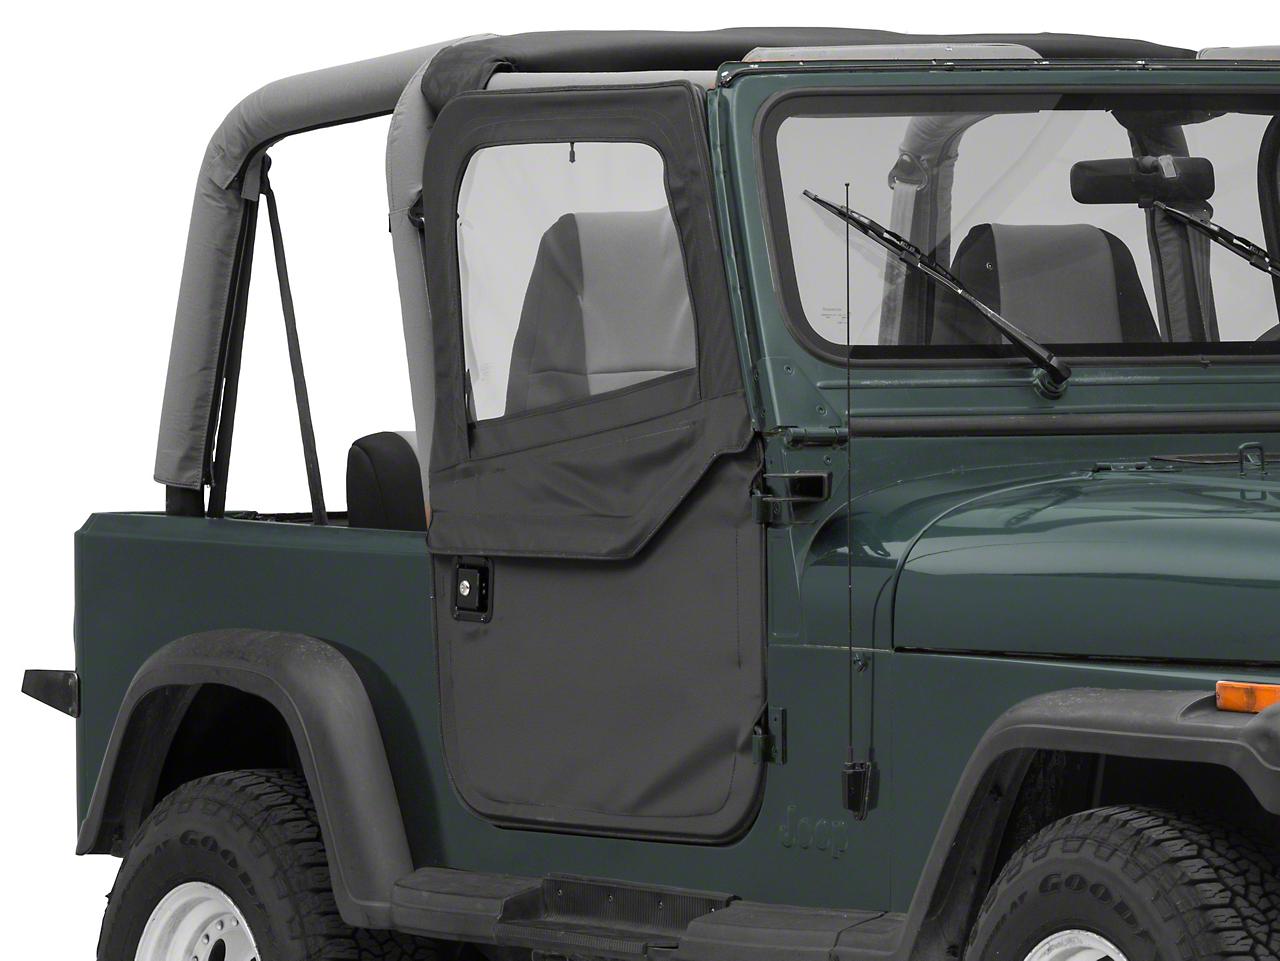 Bestop 2-Piece Full Fabric Doors - Black Denim (87-95 Jeep Wrangler YJ)